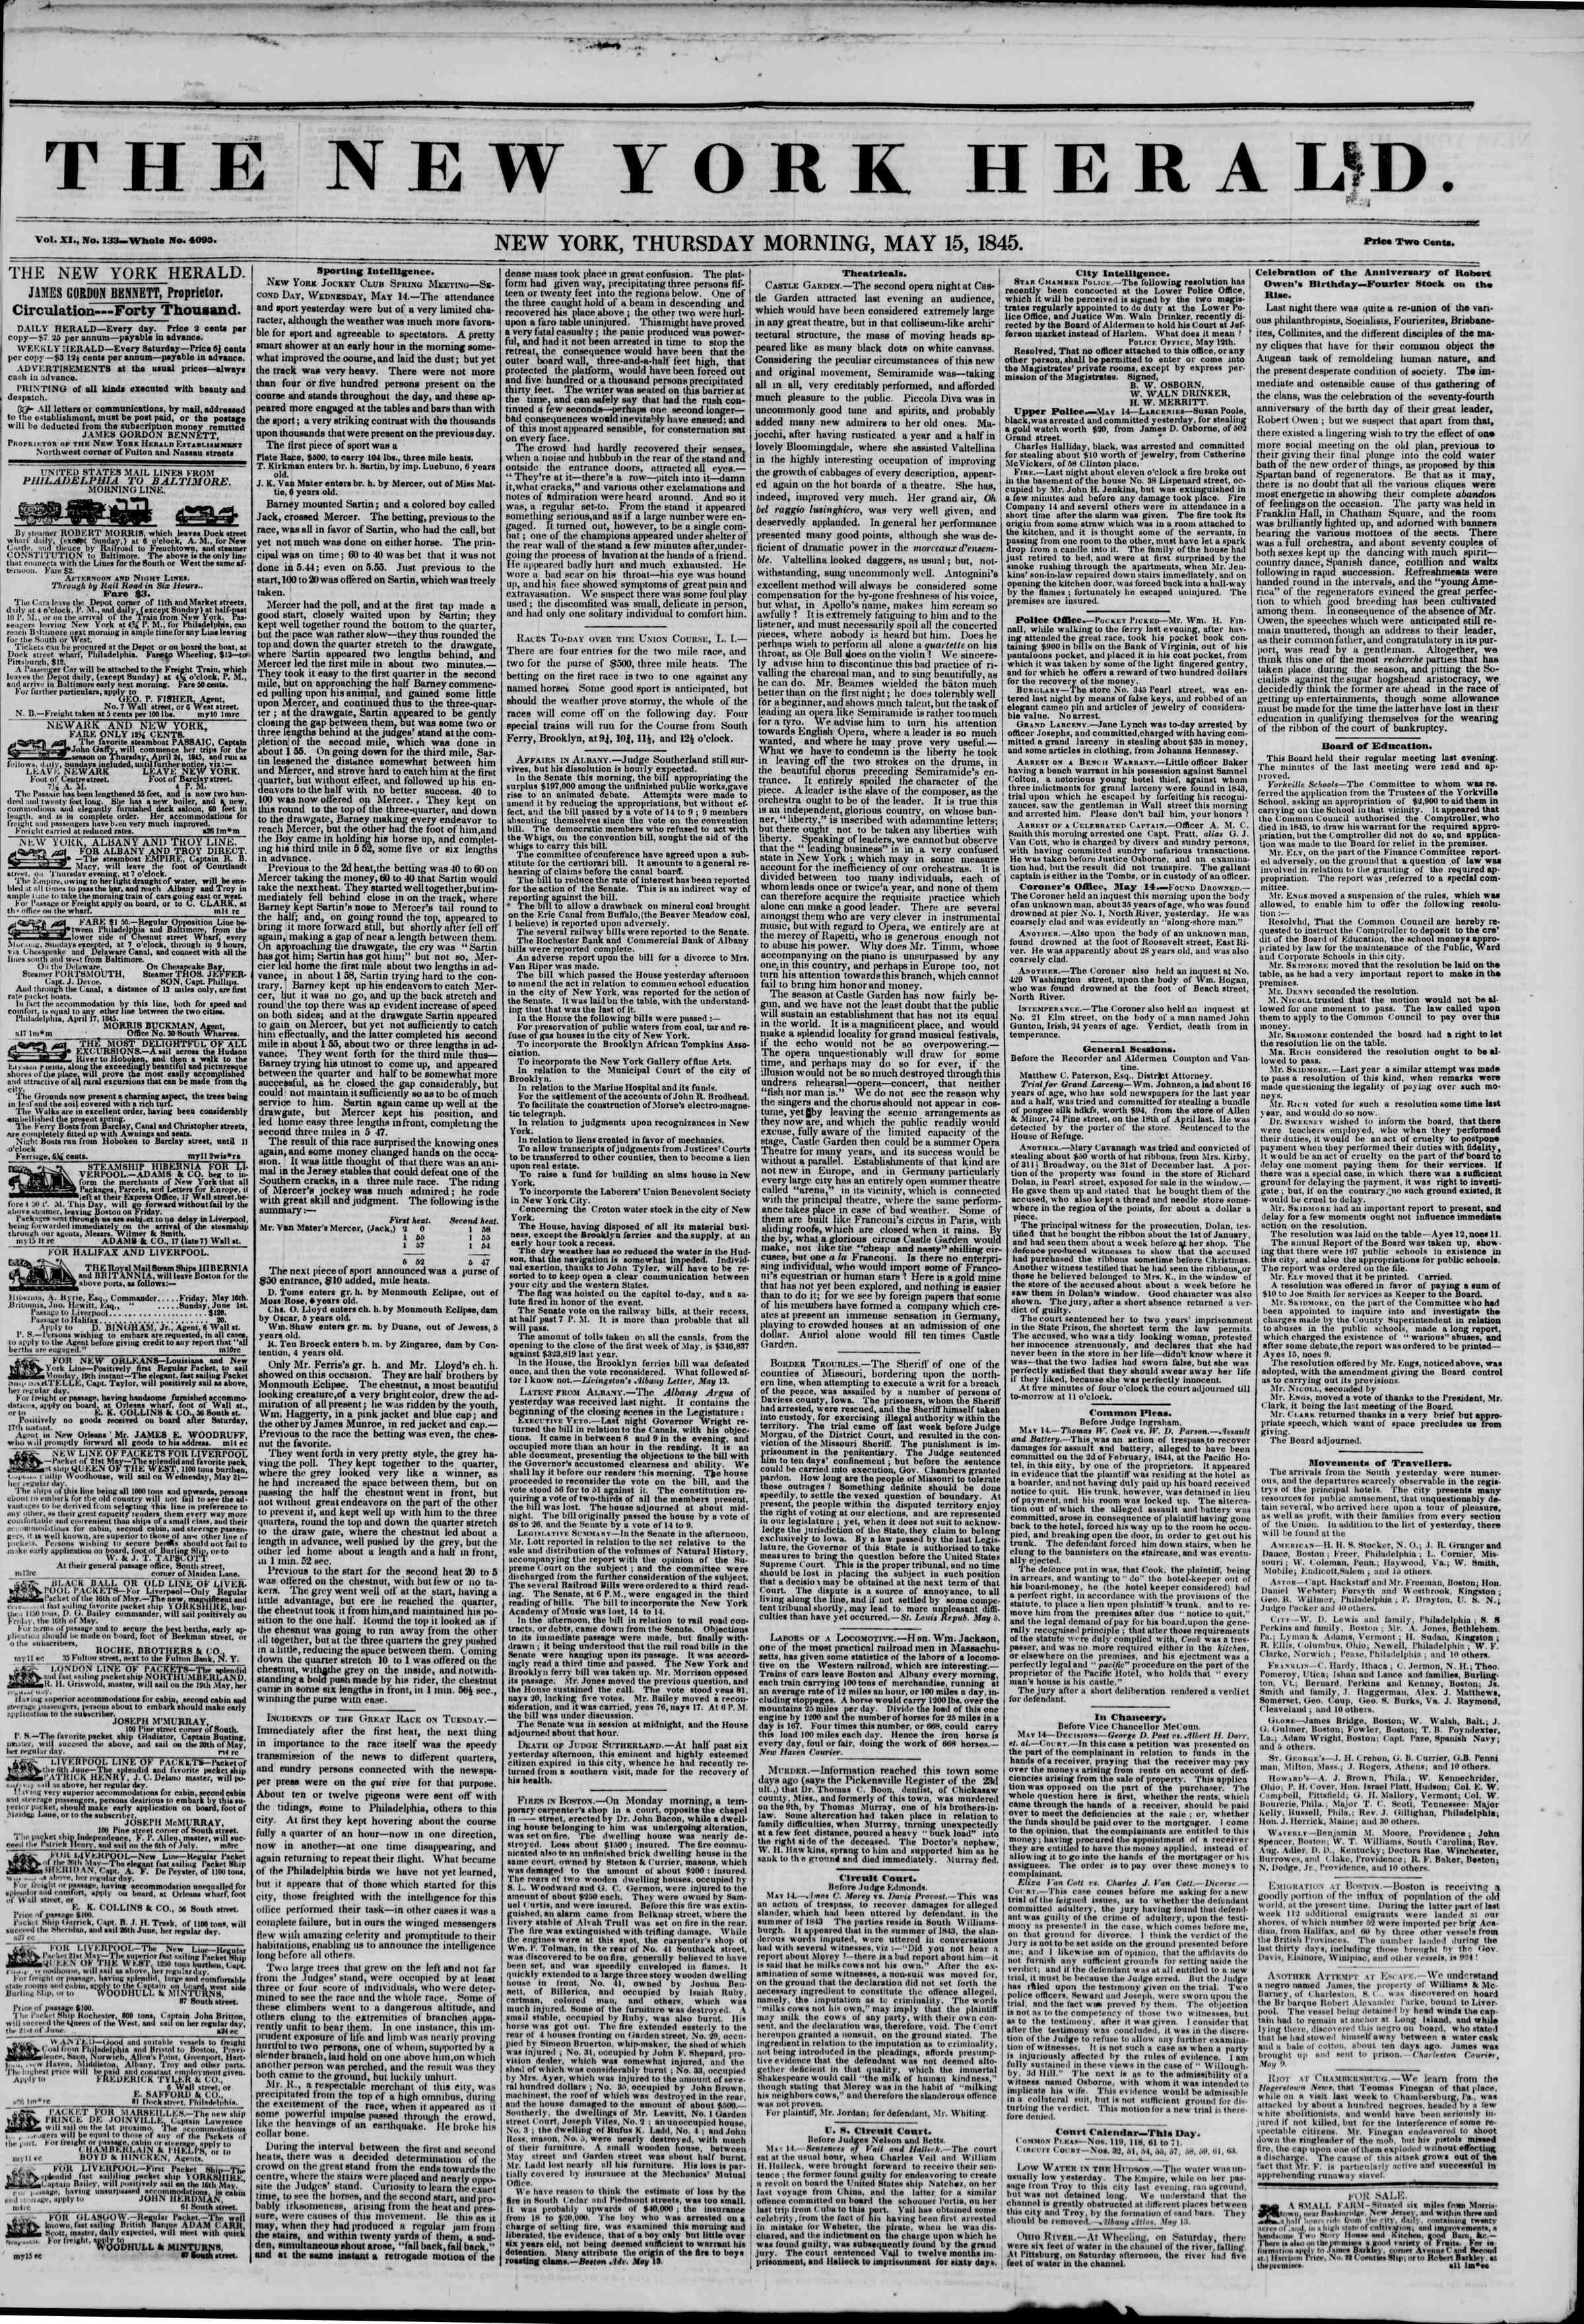 May 15, 1845 Tarihli The New York Herald Gazetesi Sayfa 1